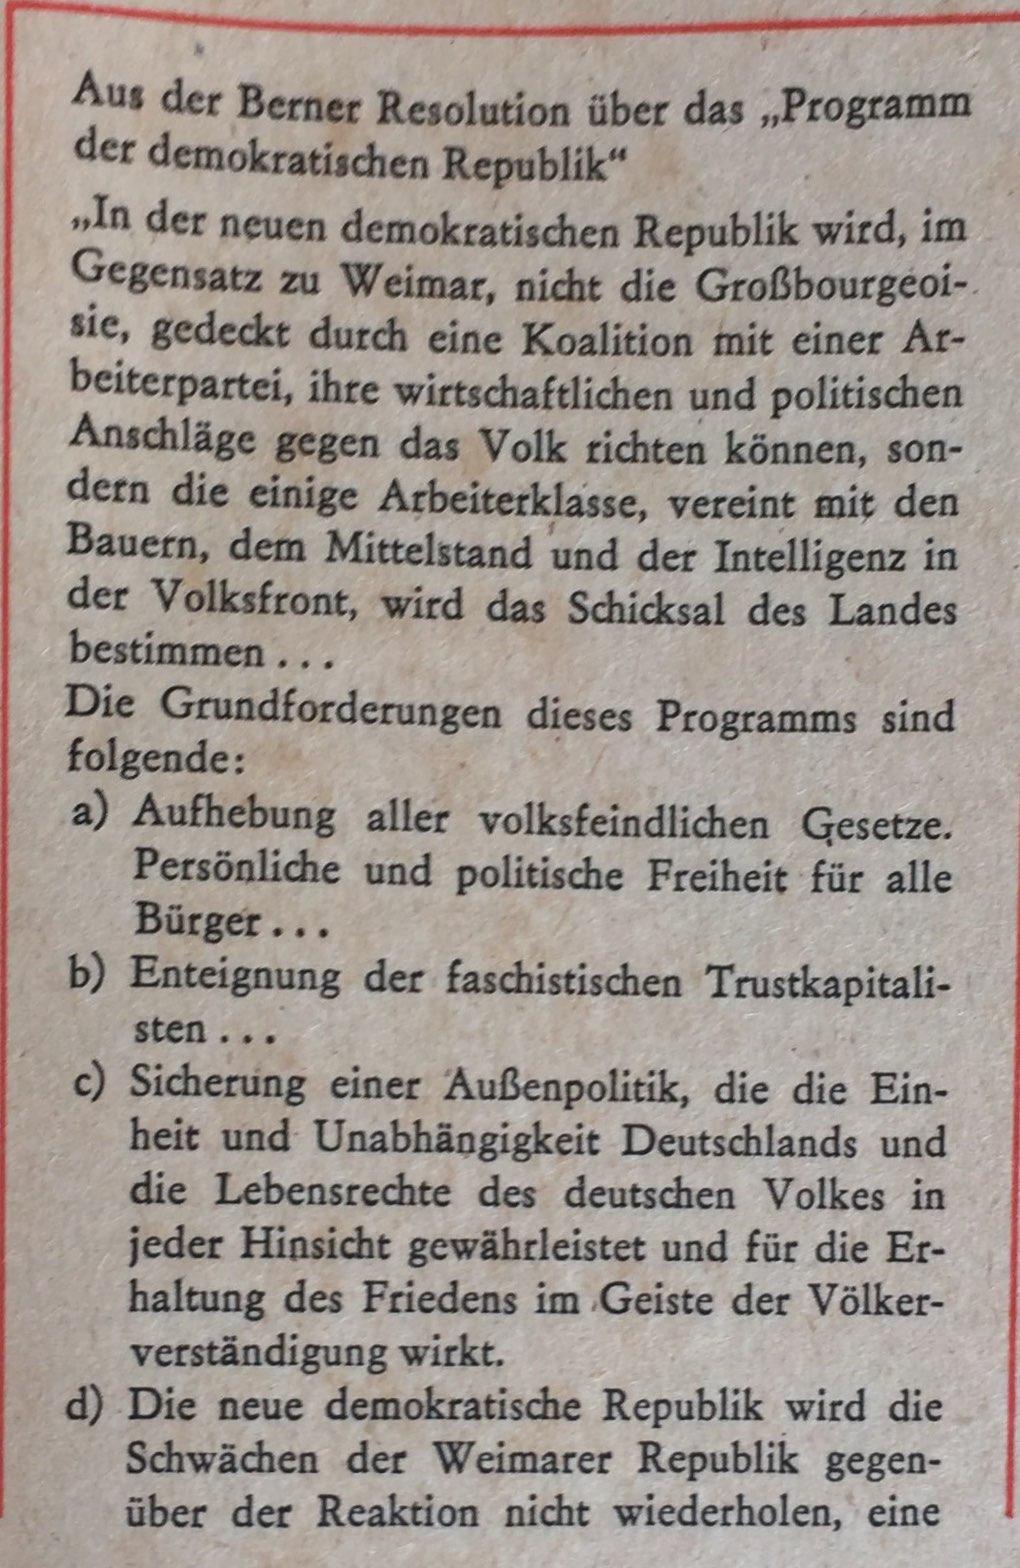 Berner Resolution Programm demokratische Republik